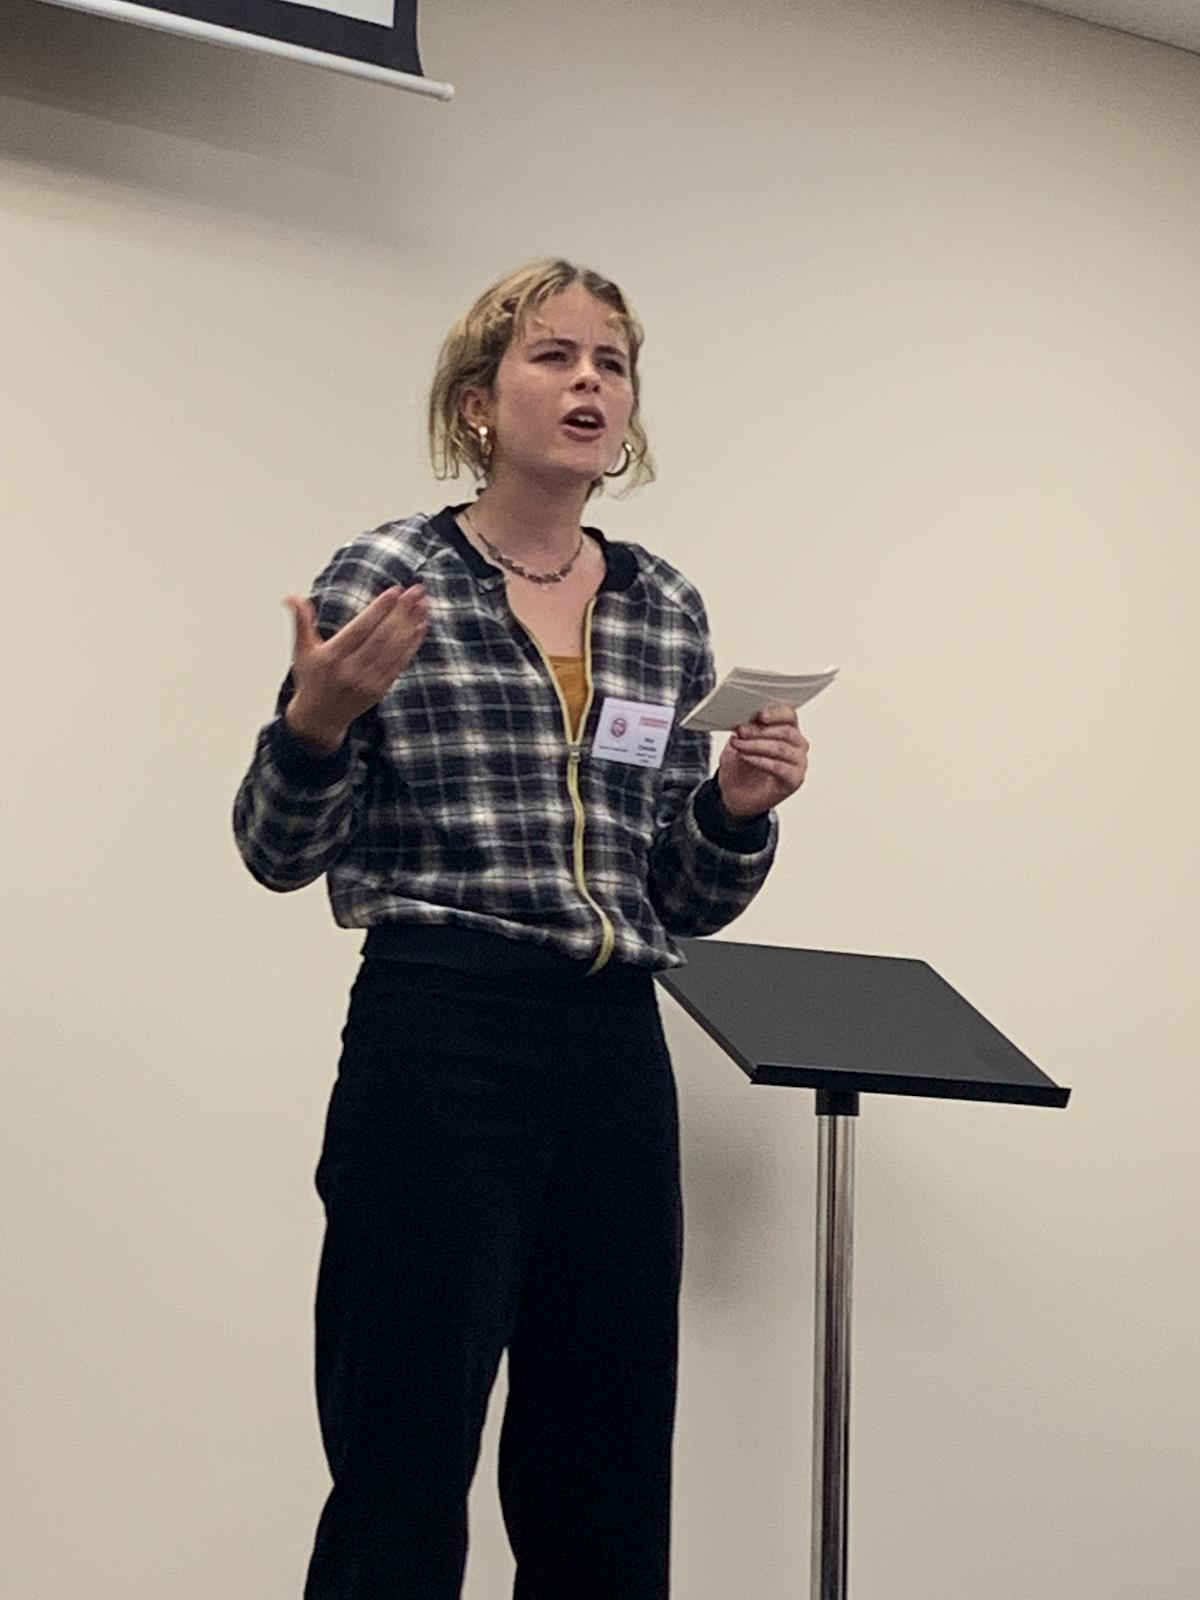 NCW 2nd place speech winner – Isobel Christie